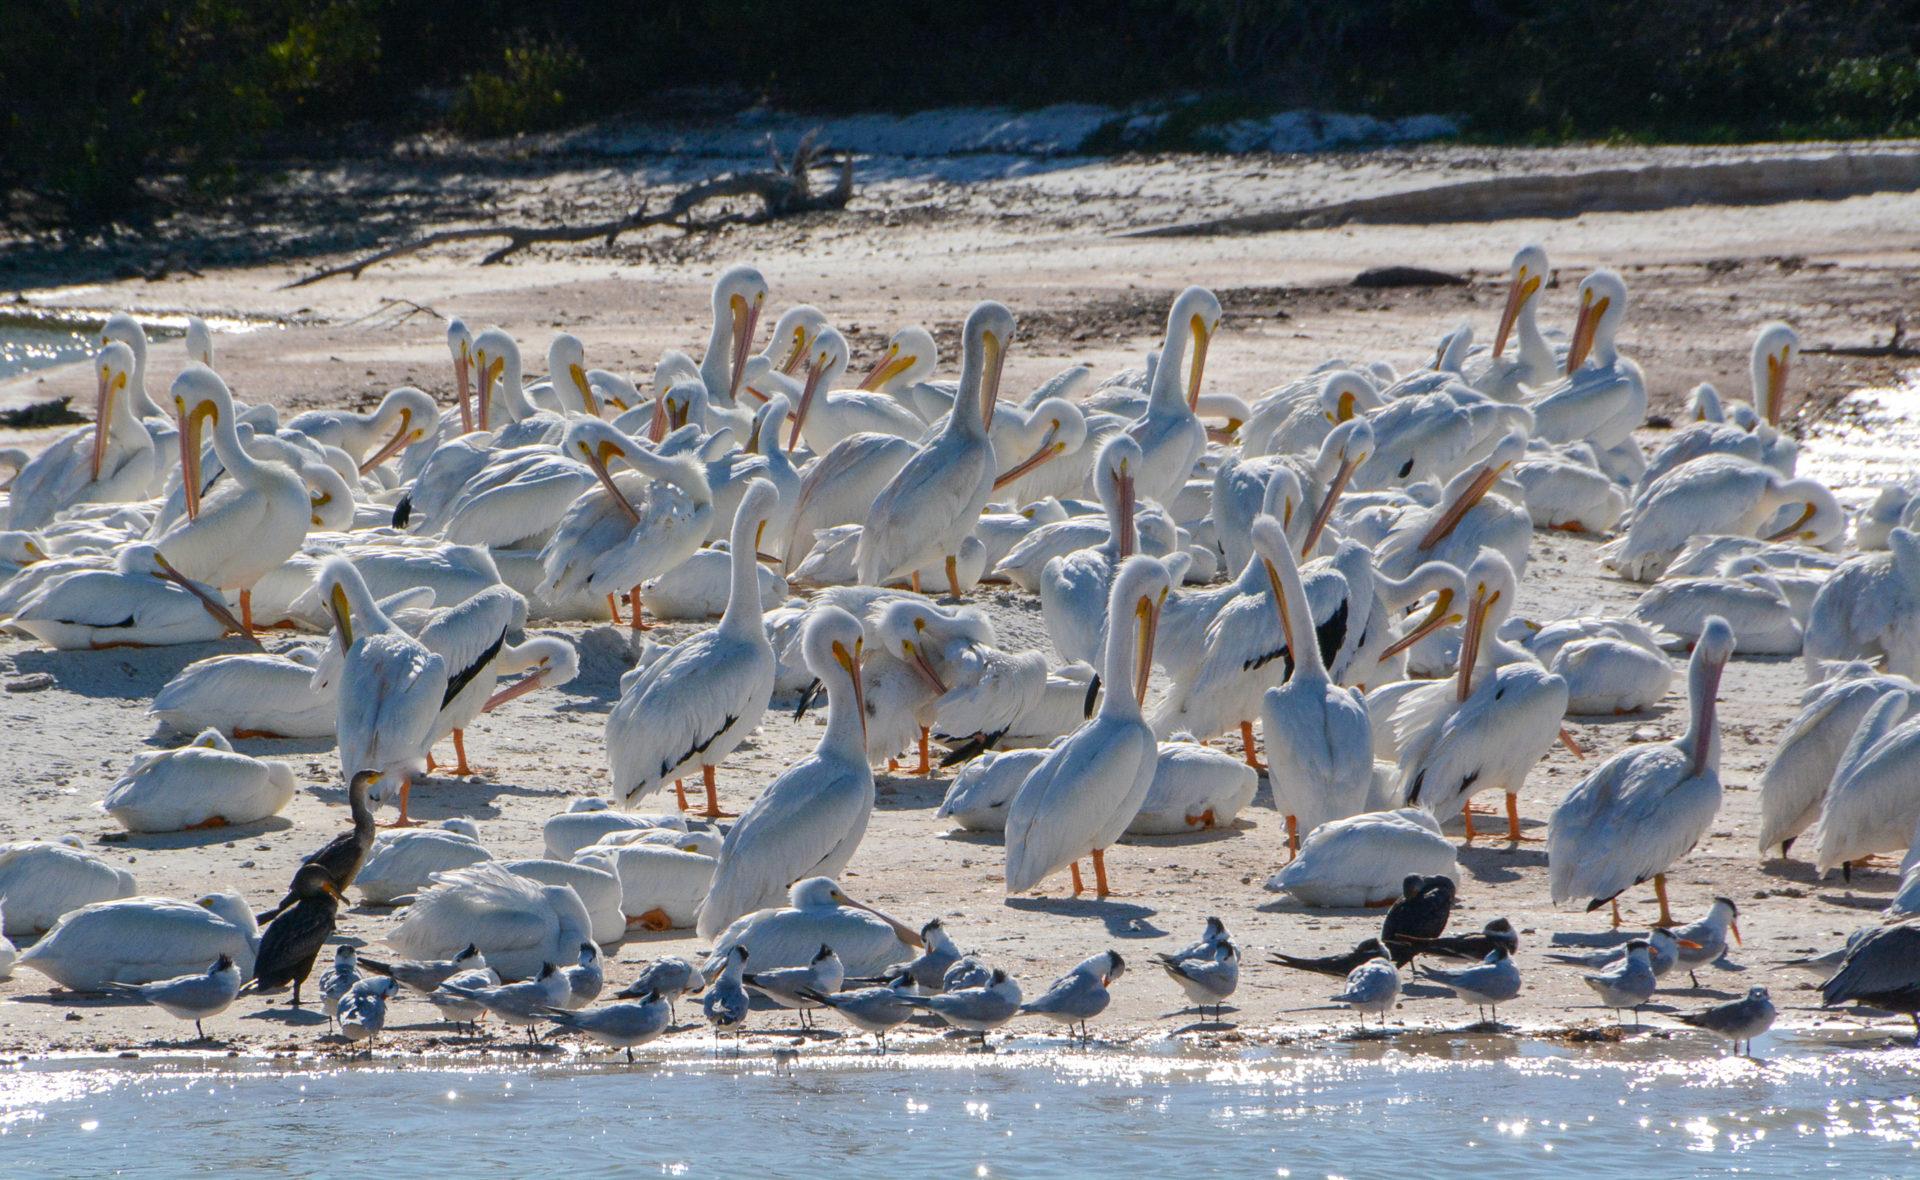 Kolonie weißer Pelikane in den Ten Thousand Islands in Florida